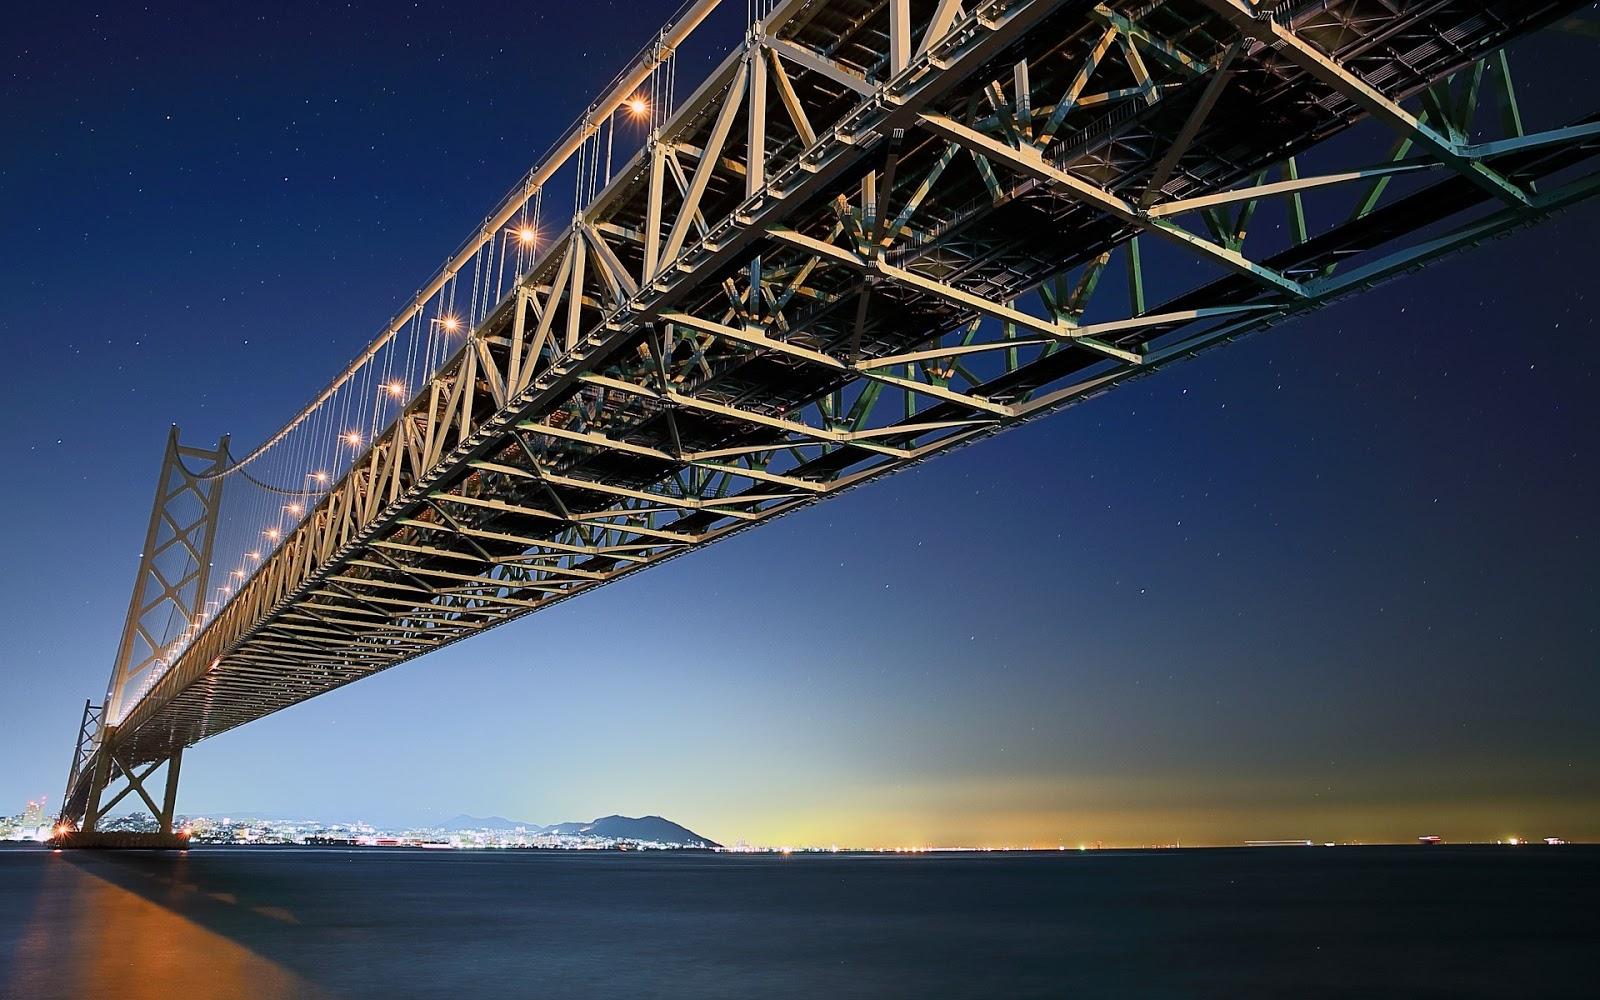 Akashi Kaikyo A Ponte Suspensa Mais Longa Do Mundo Pet